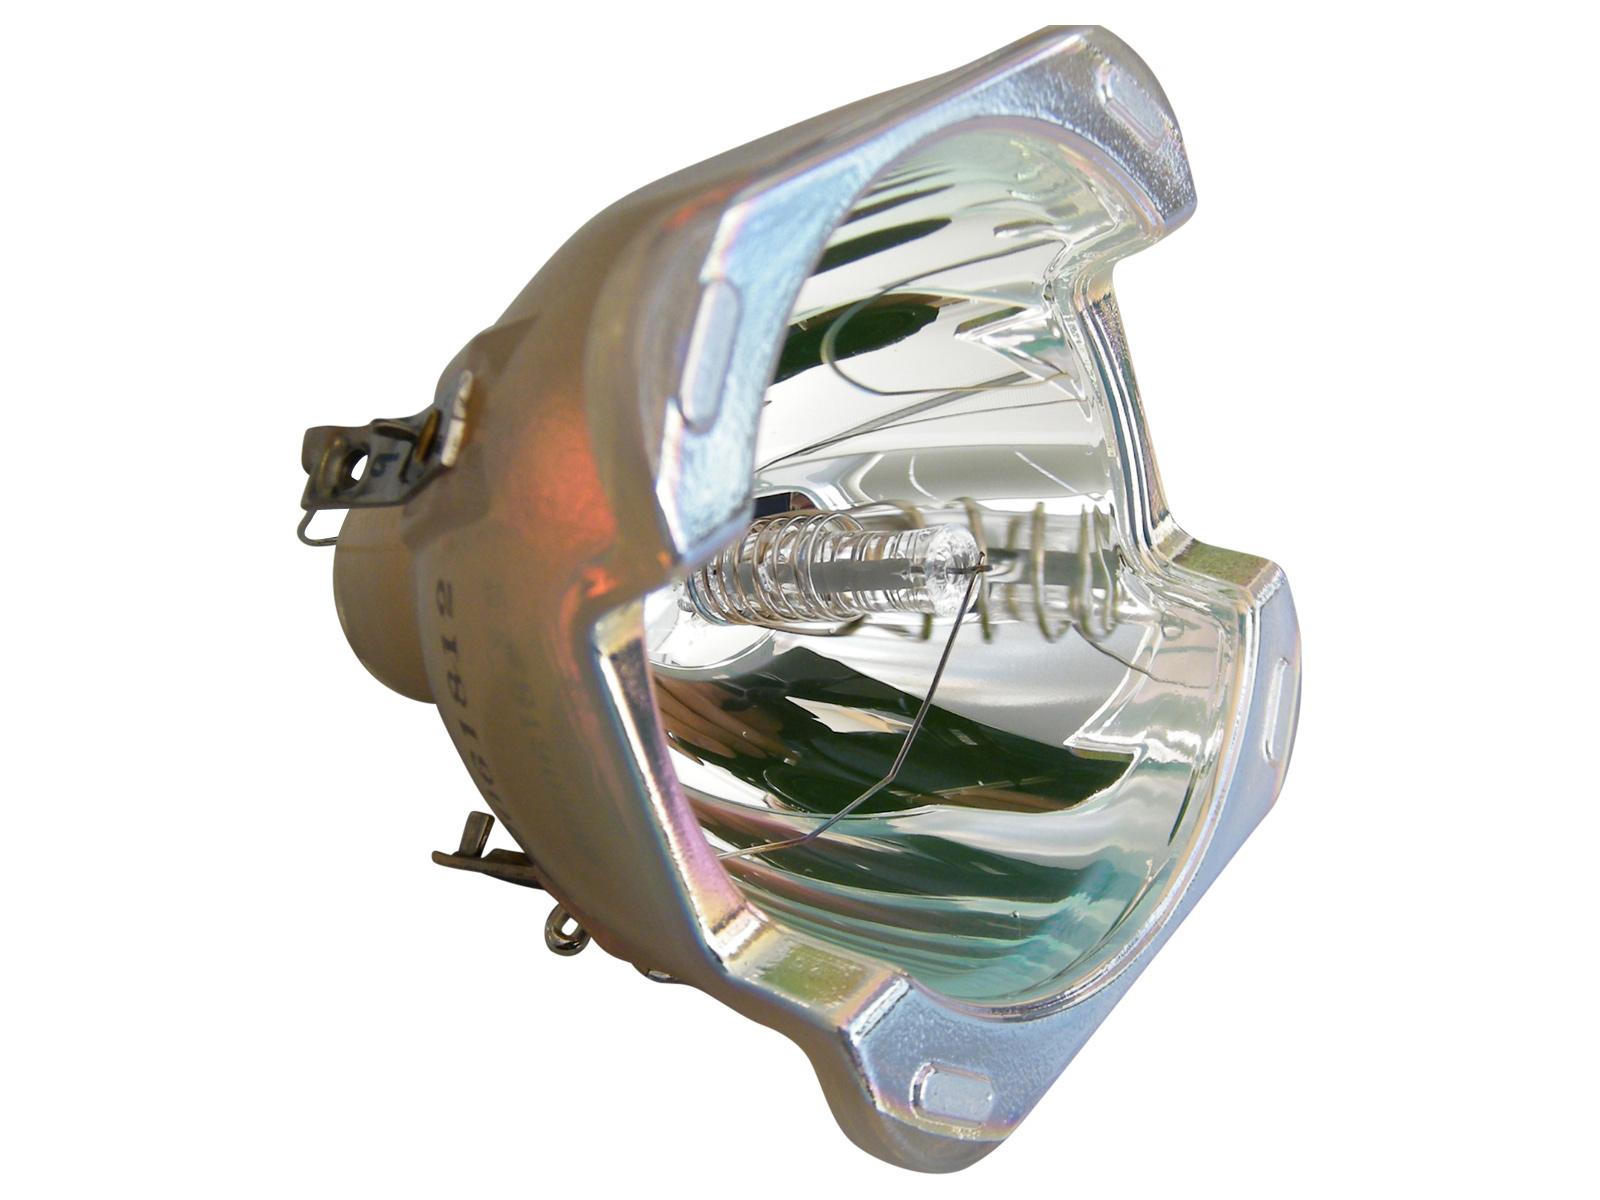 Lampa pro projektor LG AJ-LBX5 AJ-LBX50 Lampa Philips